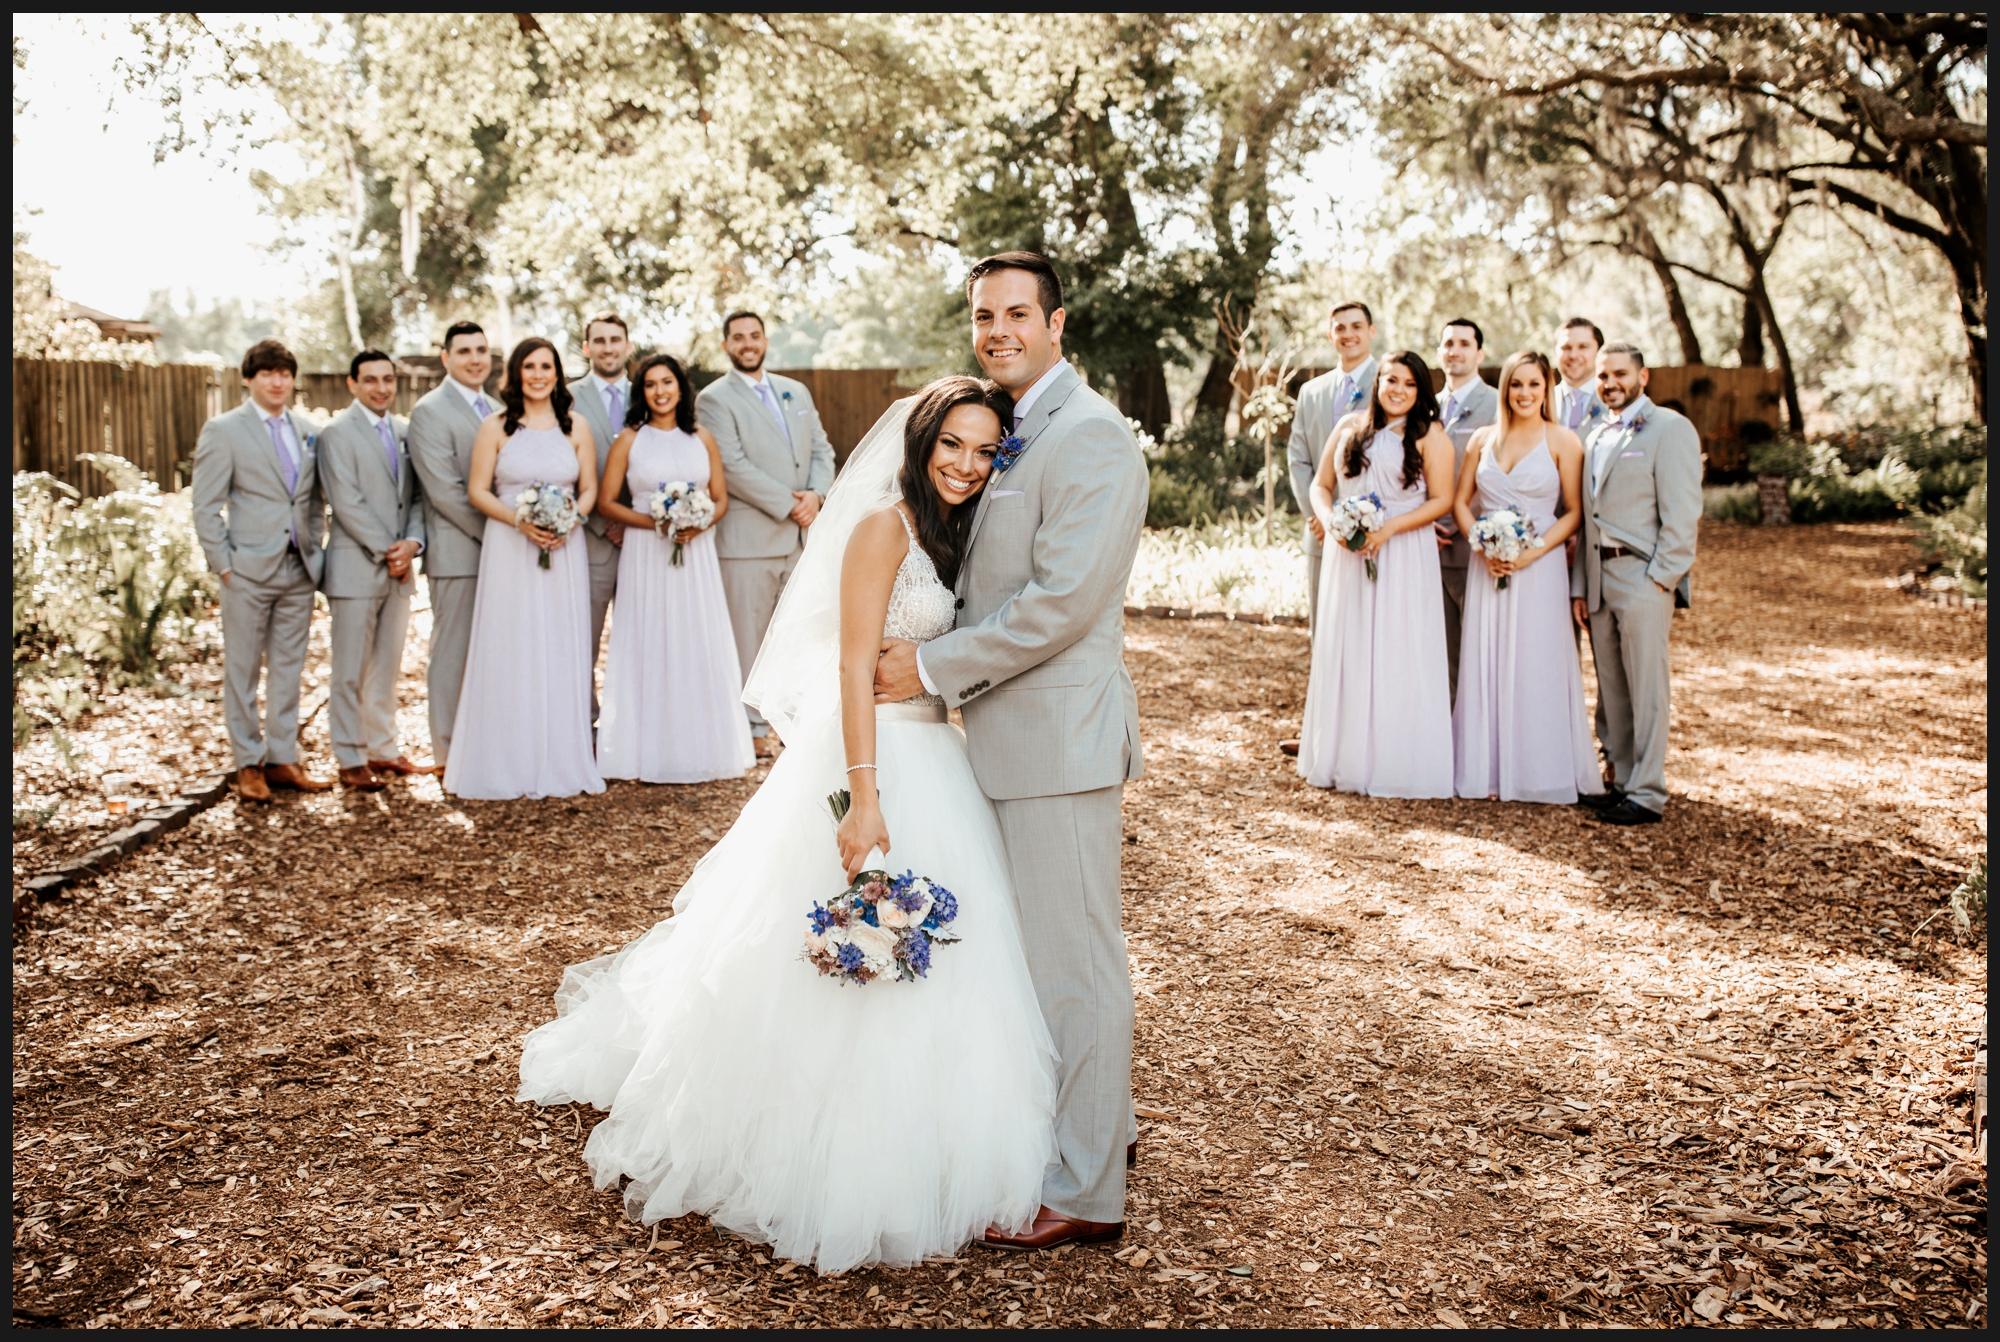 Orlando-Wedding-Photographer-destination-wedding-photographer-florida-wedding-photographer-bohemian-wedding-photographer_1620.jpg